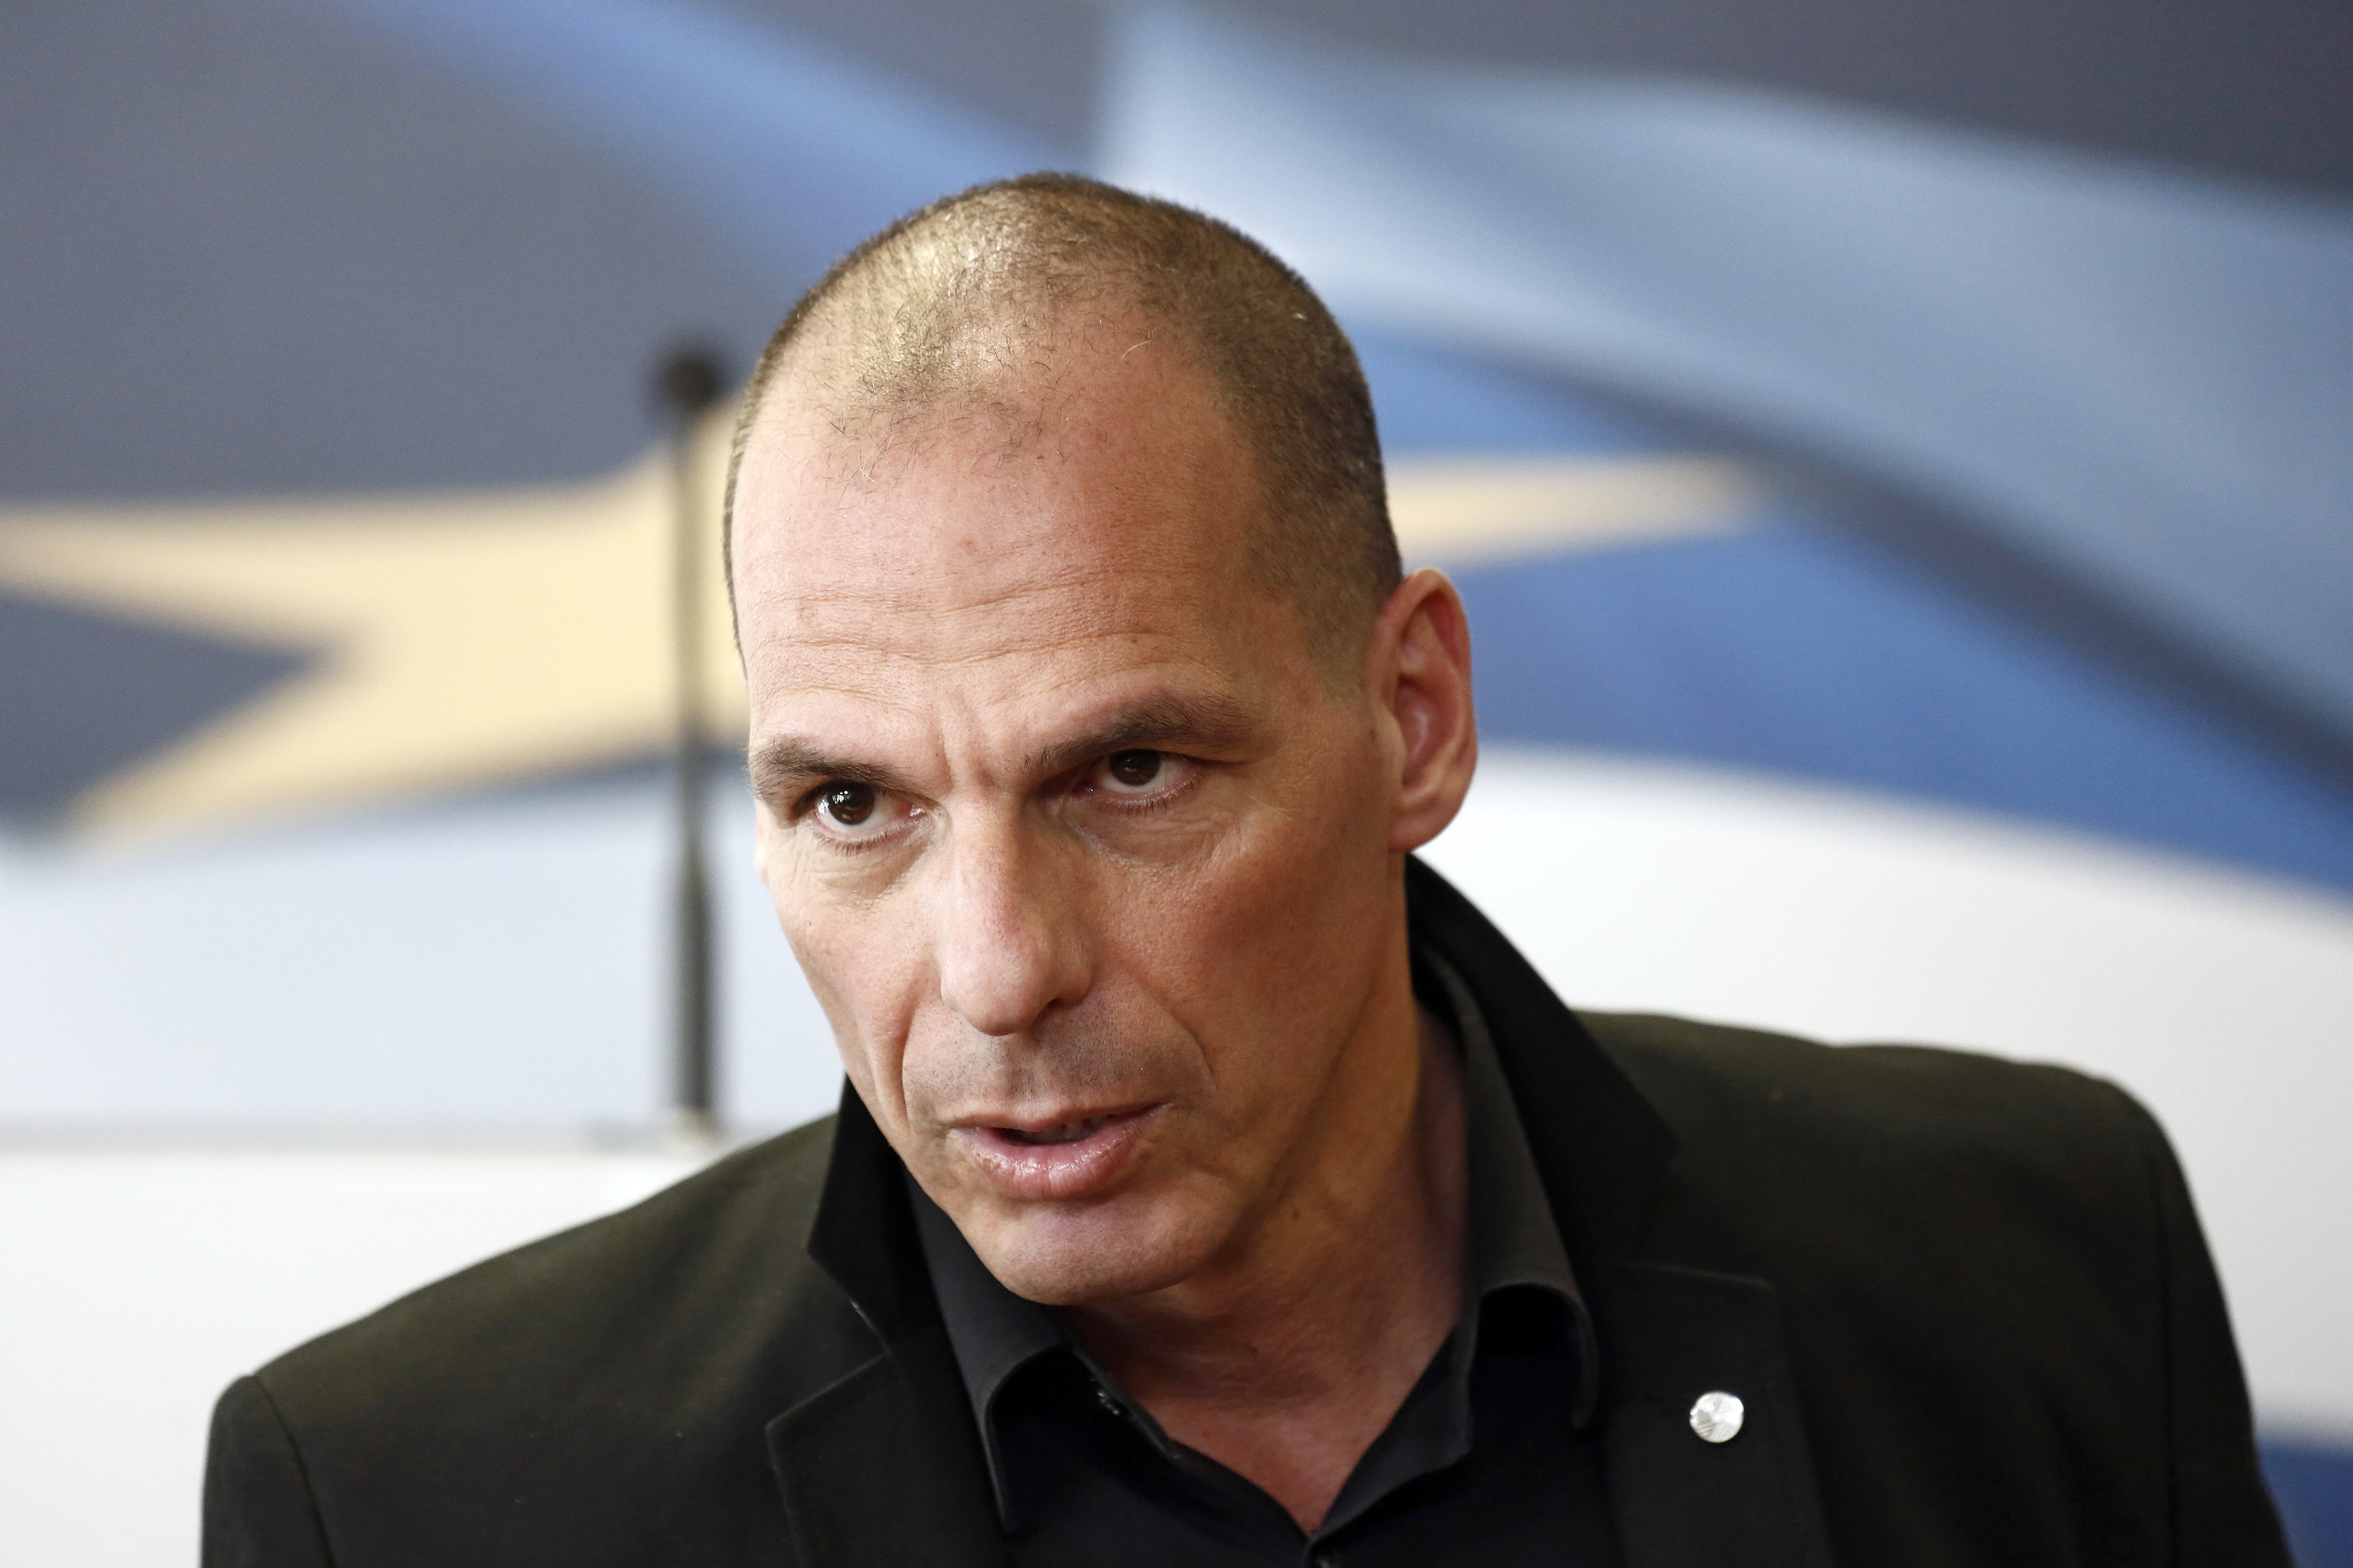 Fostul ministru grec Yanis Varoufakis, atac la premierul demisionar Alexis Tsipras: